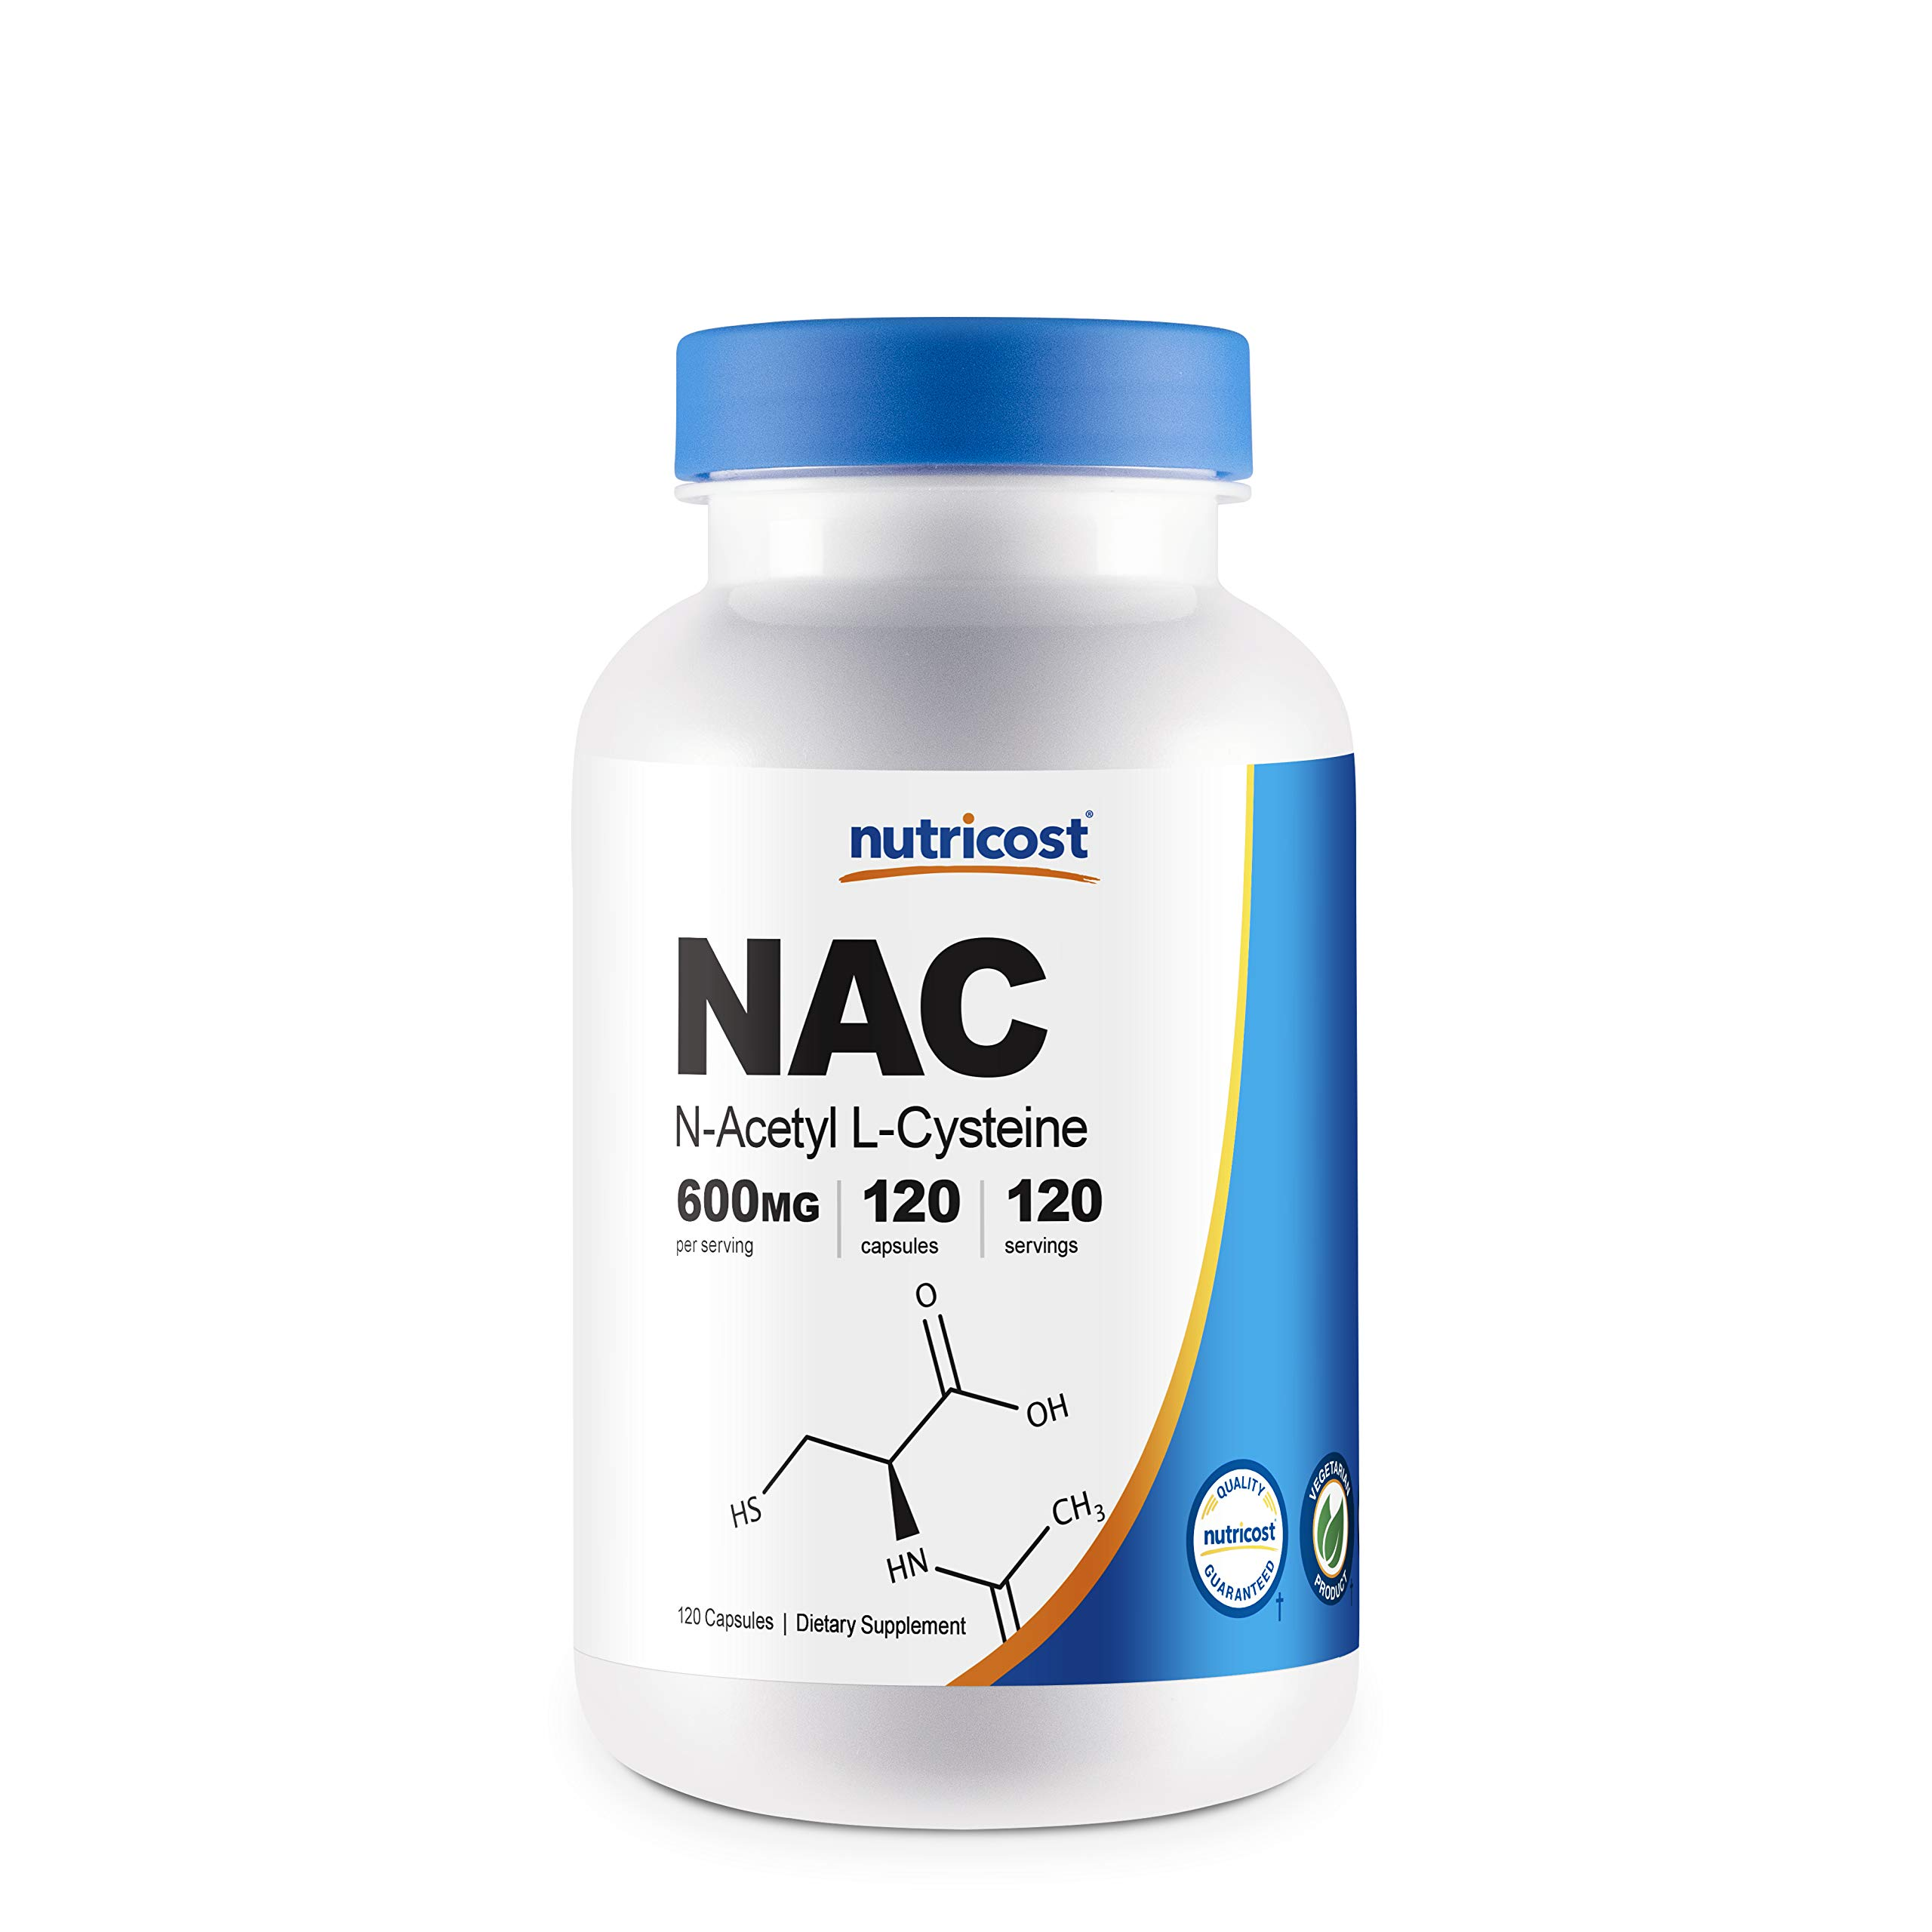 Nutricost N-Acetyl L-Cysteine (NAC) 600mg, 120 Vegetarian Capsules - Non-GMO, Gluten Free, Vegetarian Caps